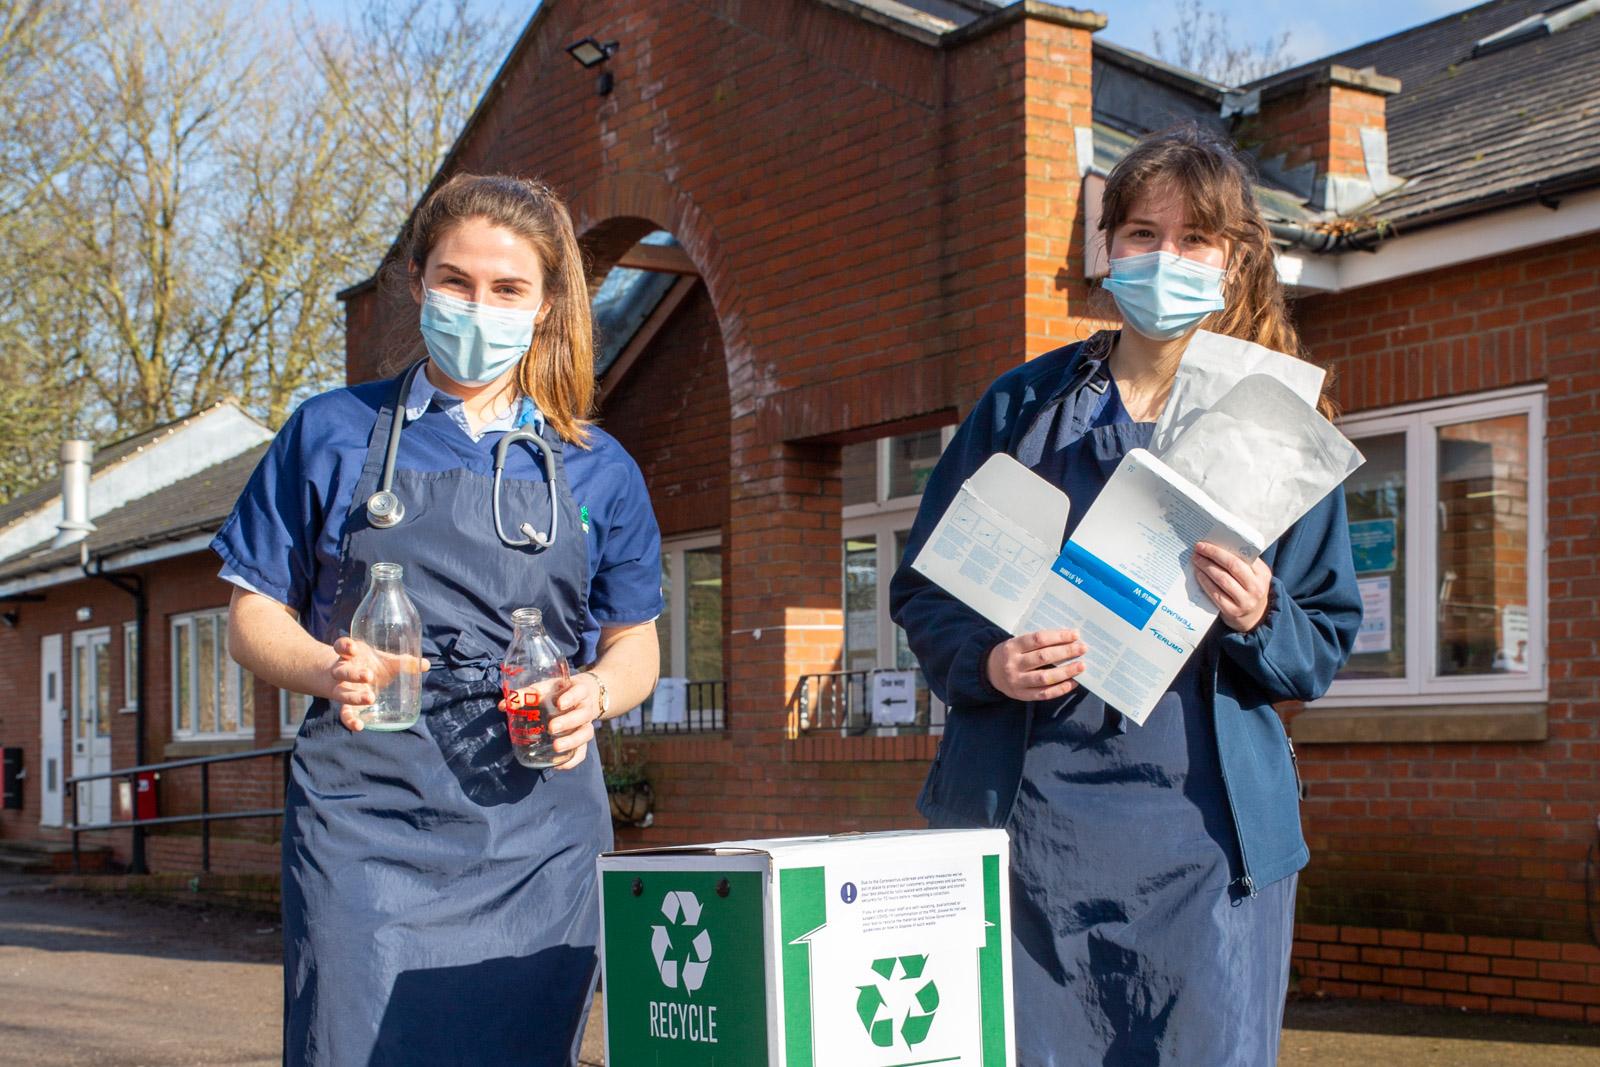 York vet practice sets sights on greener future